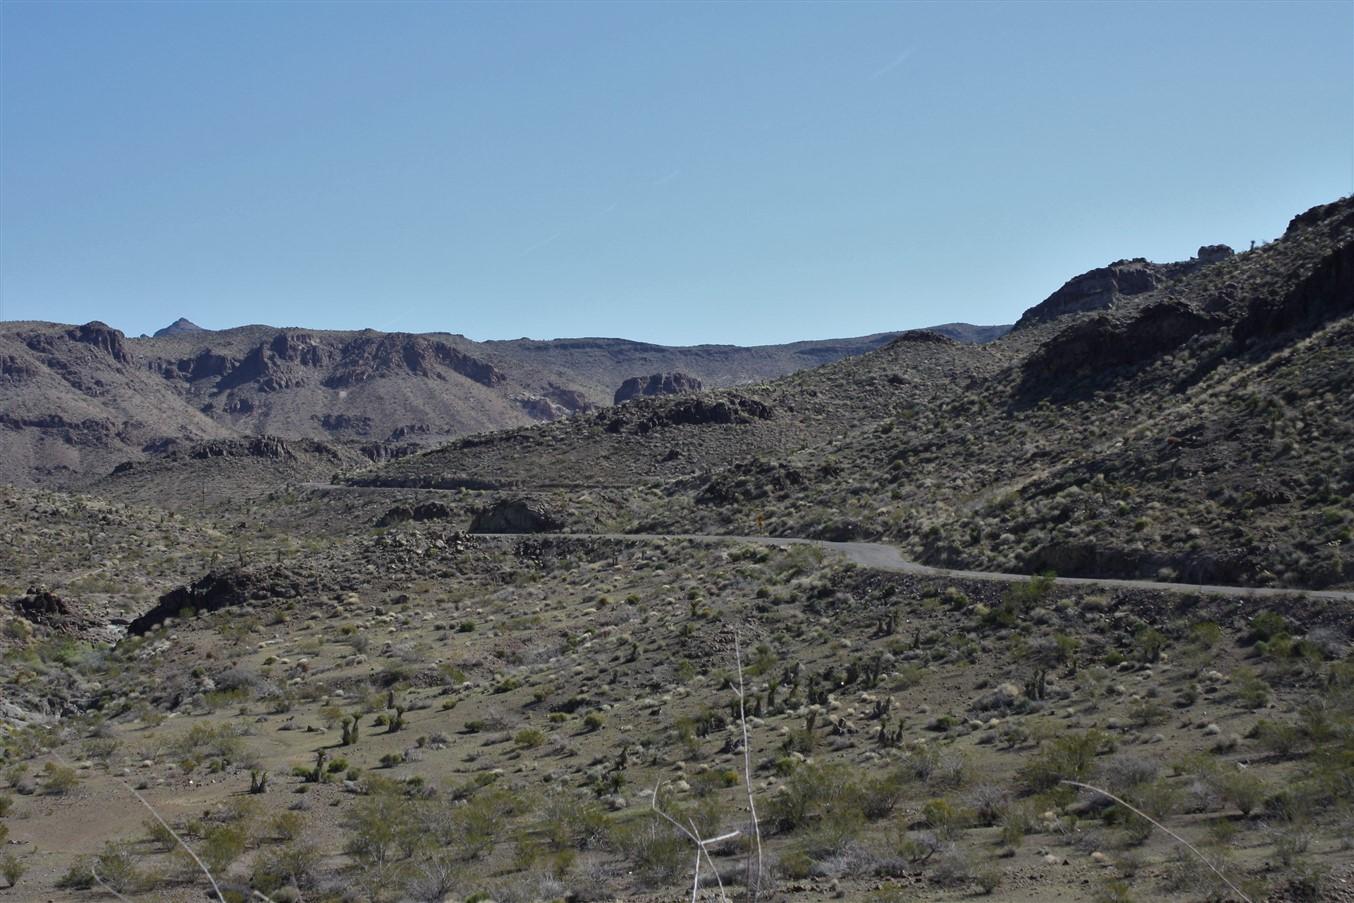 2012 03 14 Route 66 Road Trip 106 Oatman Highway Arizona.jpg